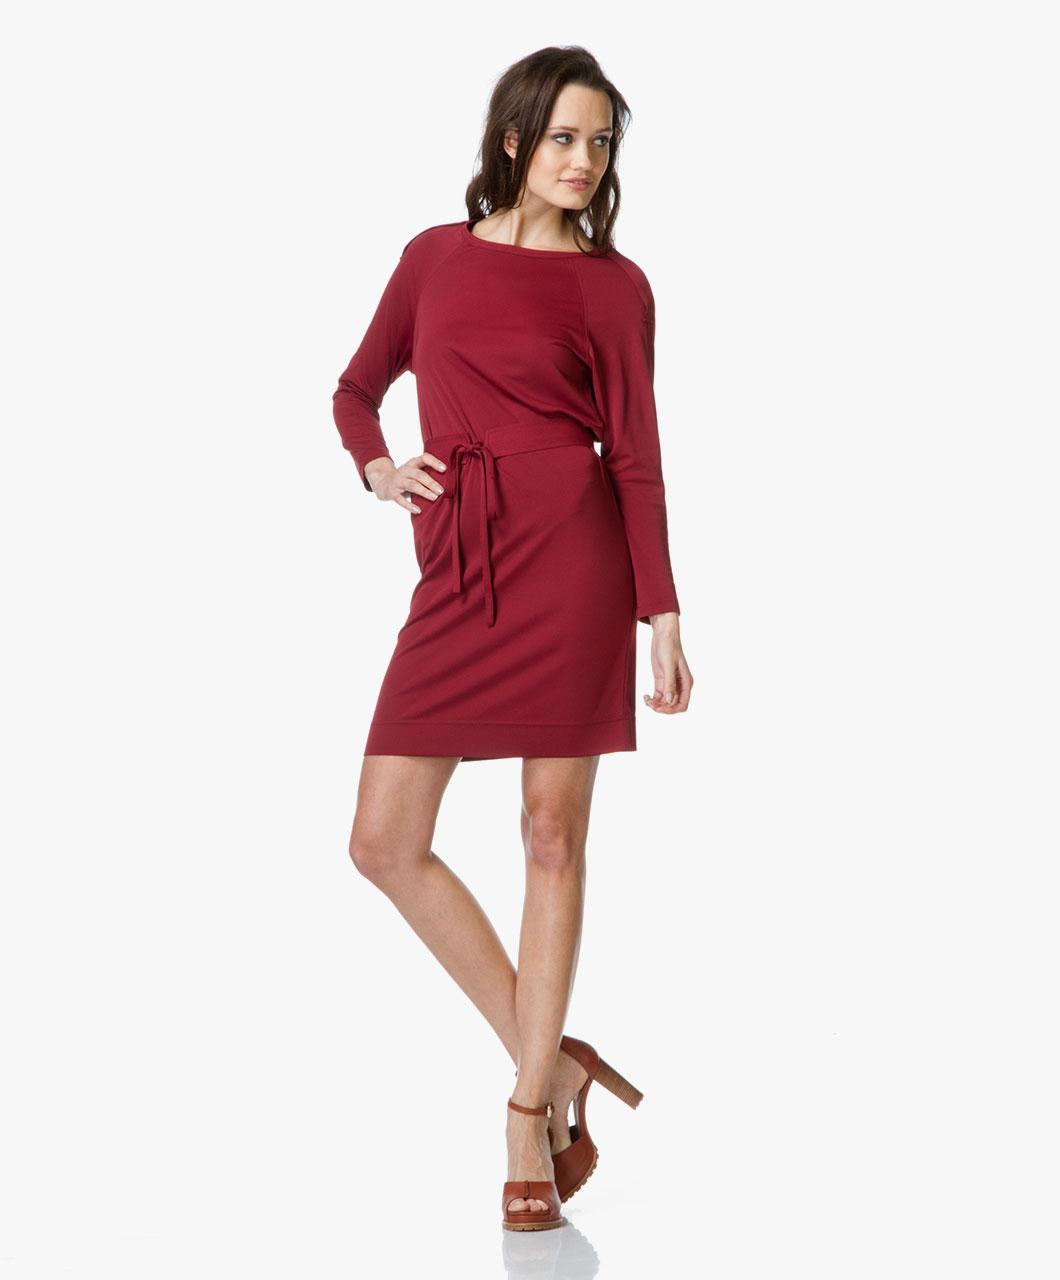 Filippa k red dress boutique